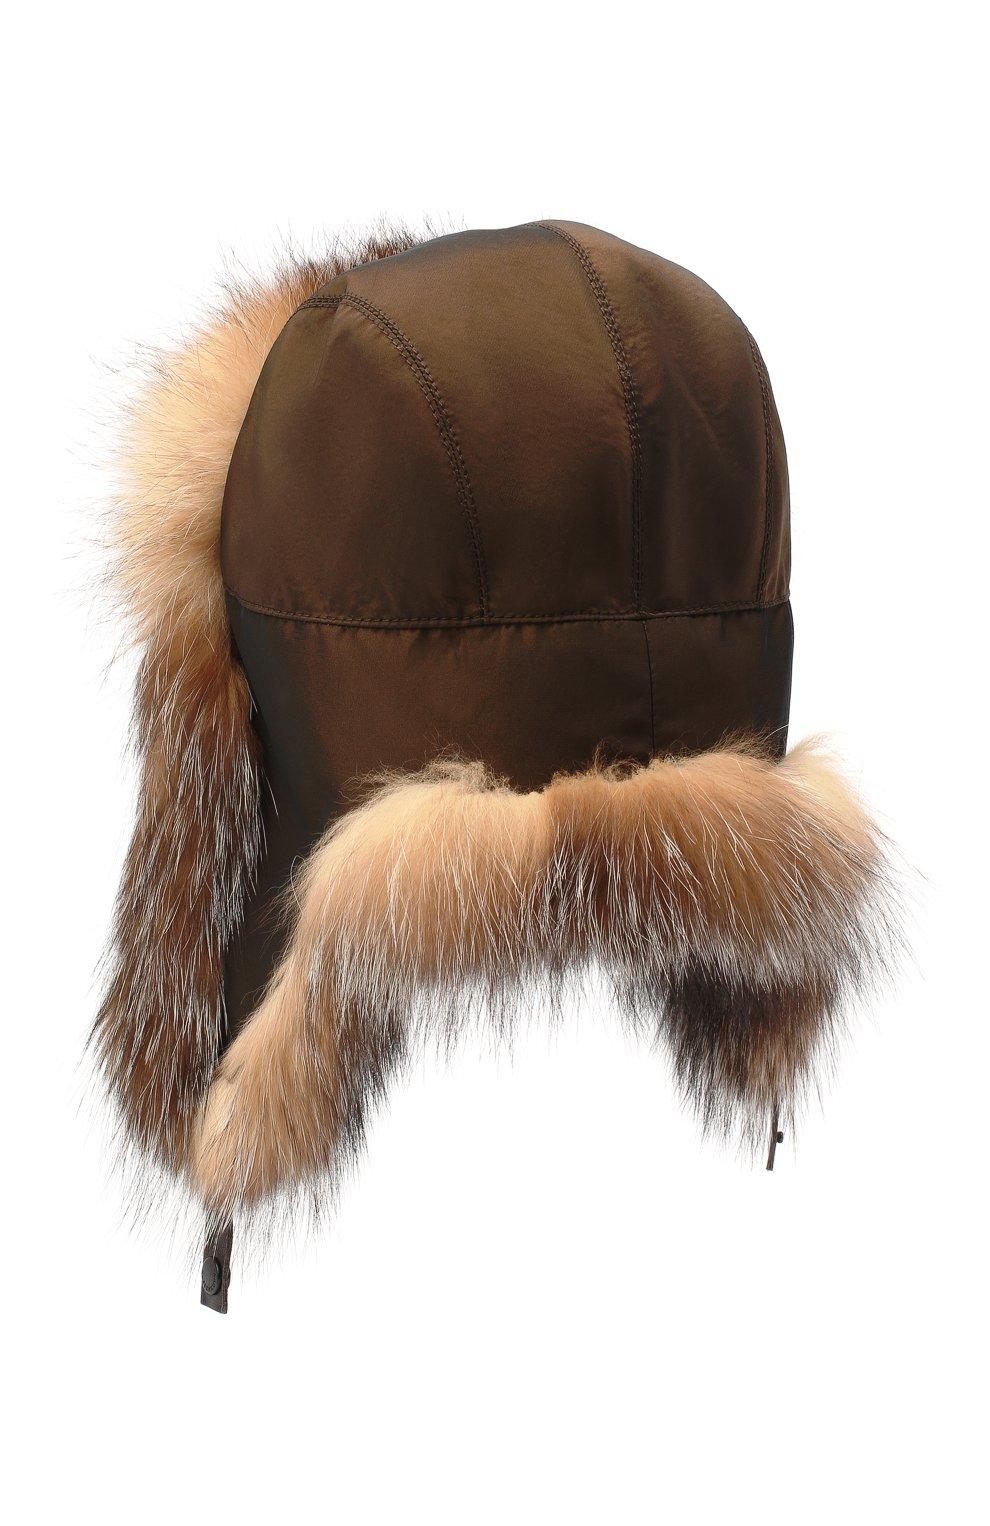 Мужская шапка-ушанка из меха лисы KUSSENKOVV коричневого цвета, арт. 339005603159   Фото 2